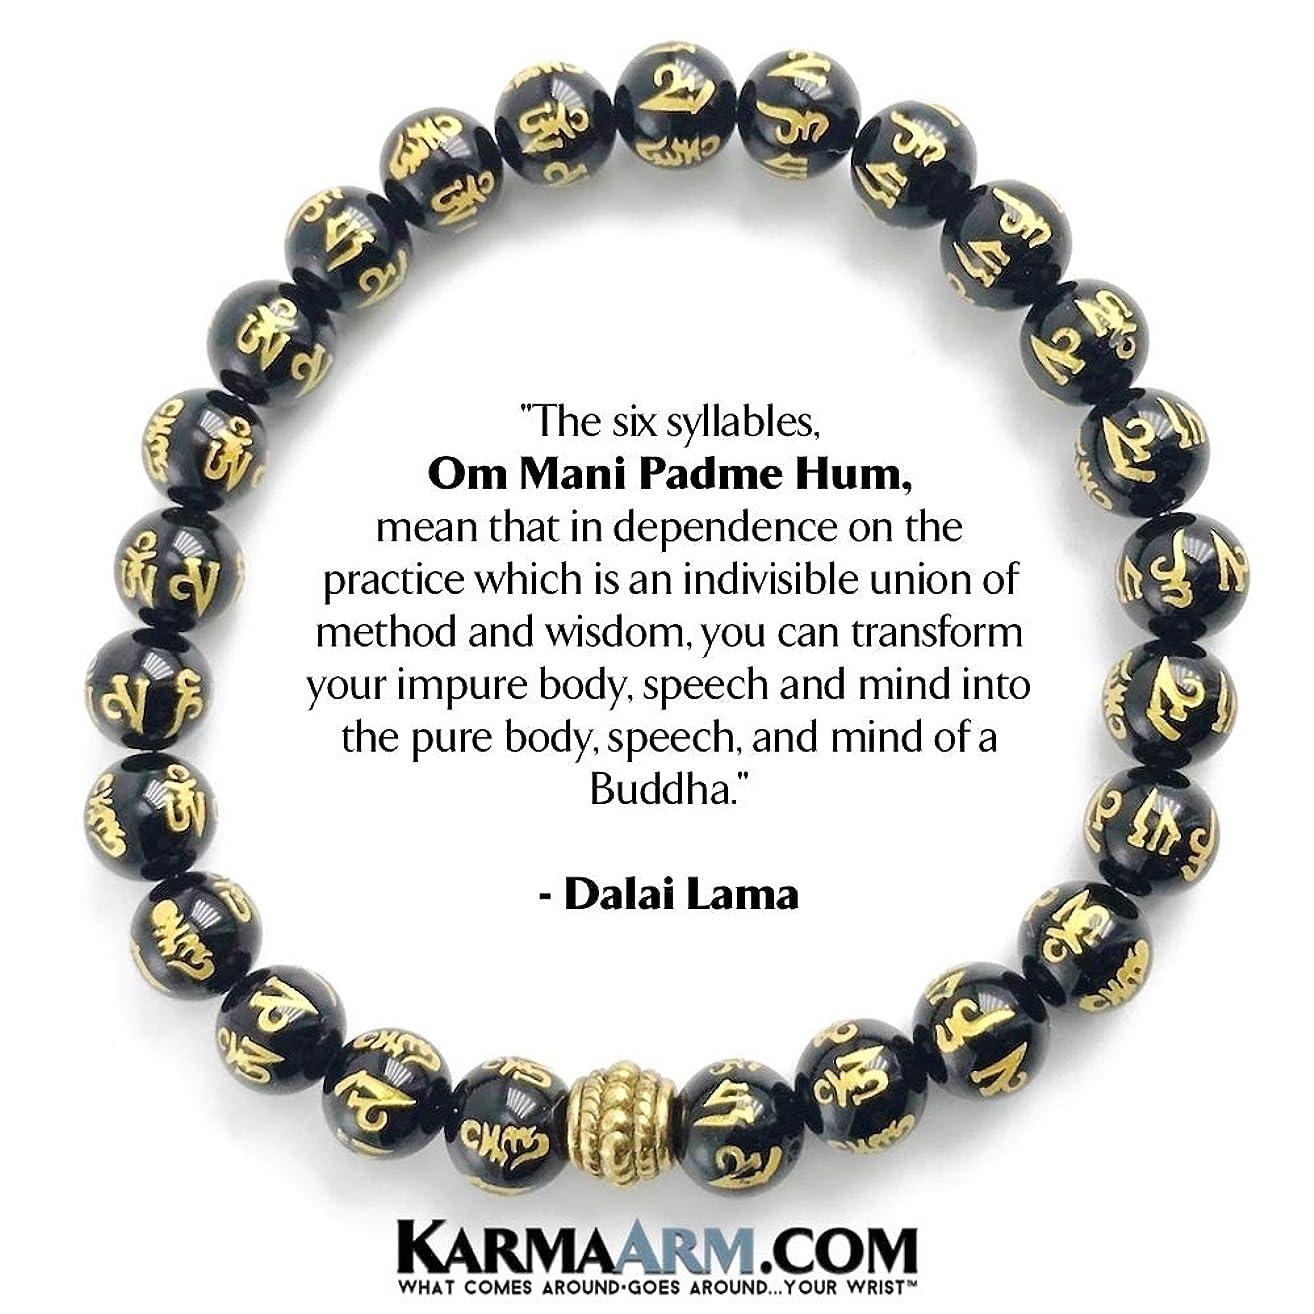 BUDDHIST Bracelets   Om Mani Padme Hum Mantra Wheel: Black Agate Beaded Bracelets   Yoga Reiki Healing Chakra BoHo Spiritual Meditation Jewelry